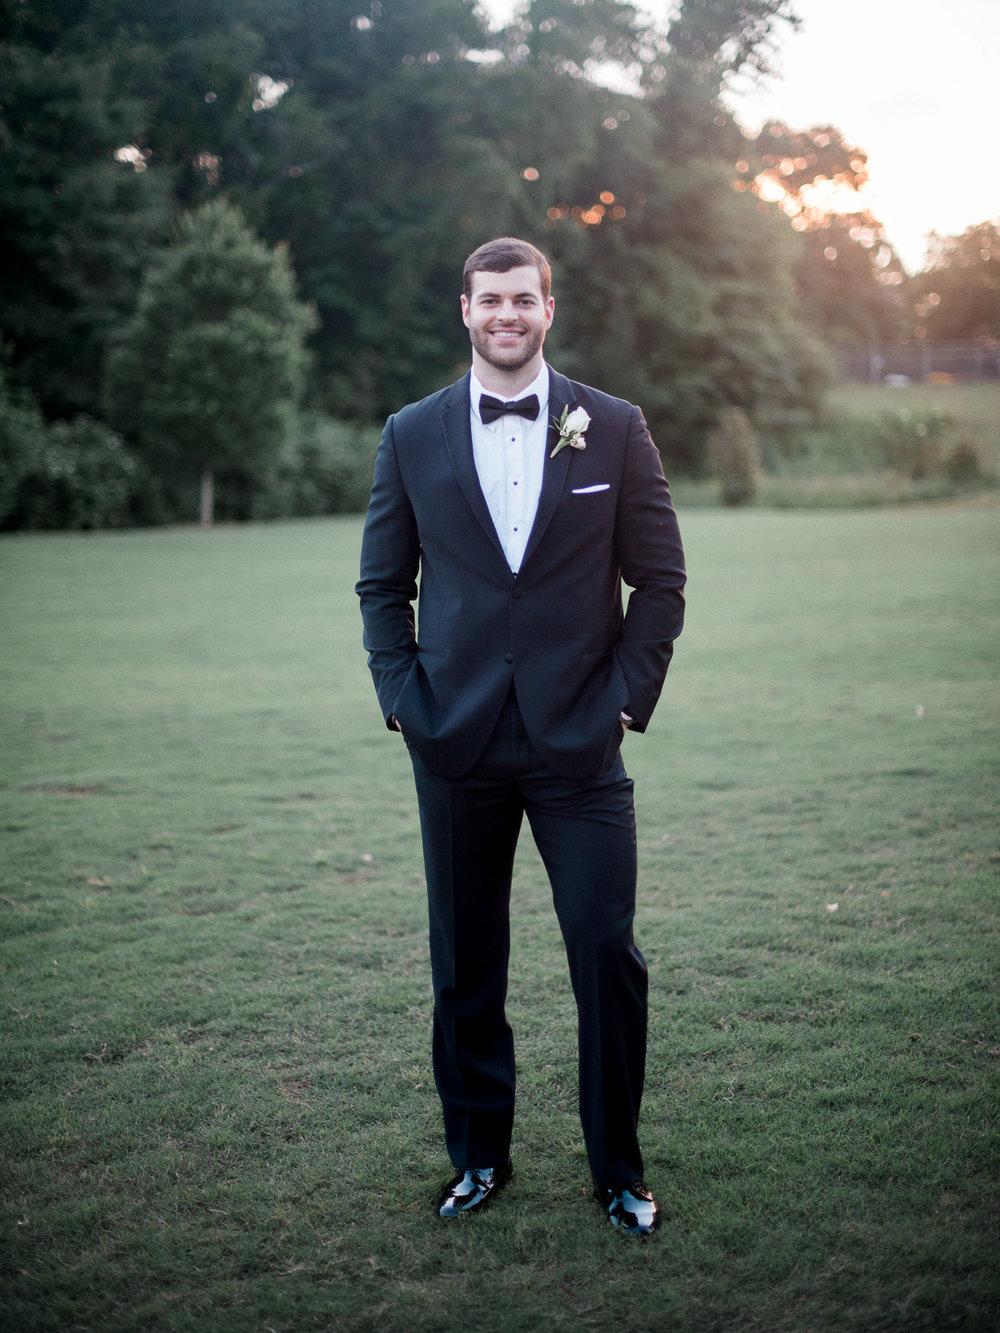 alexgreg-wedding-sunsetphotos-christinadavisphoto68.jpg